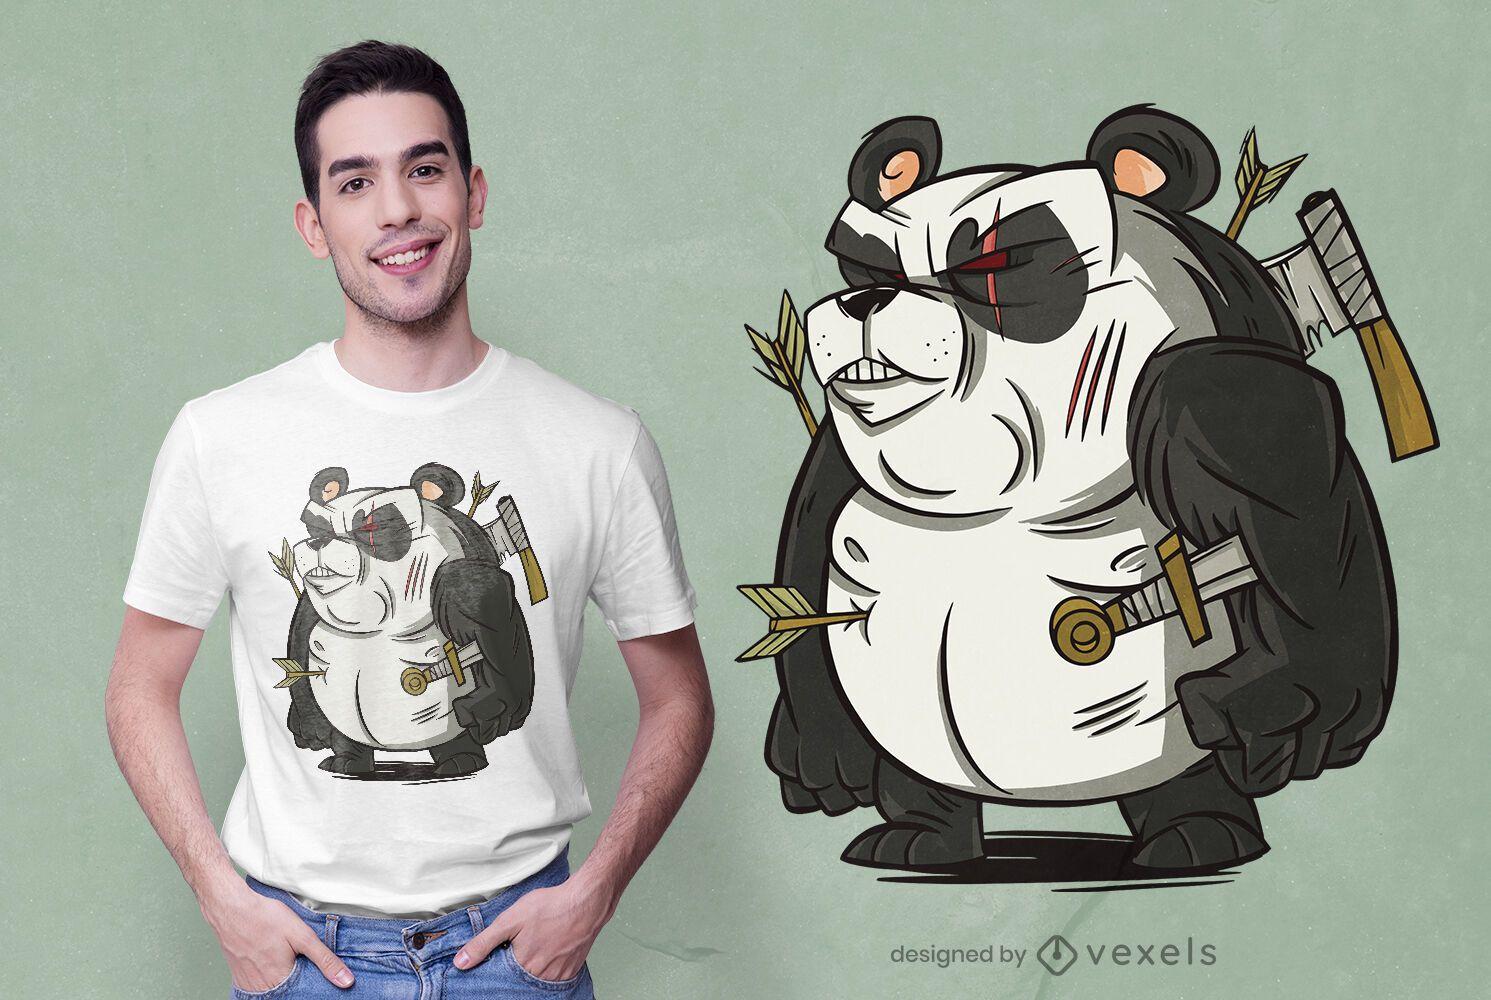 Panda warrior t-shirt design